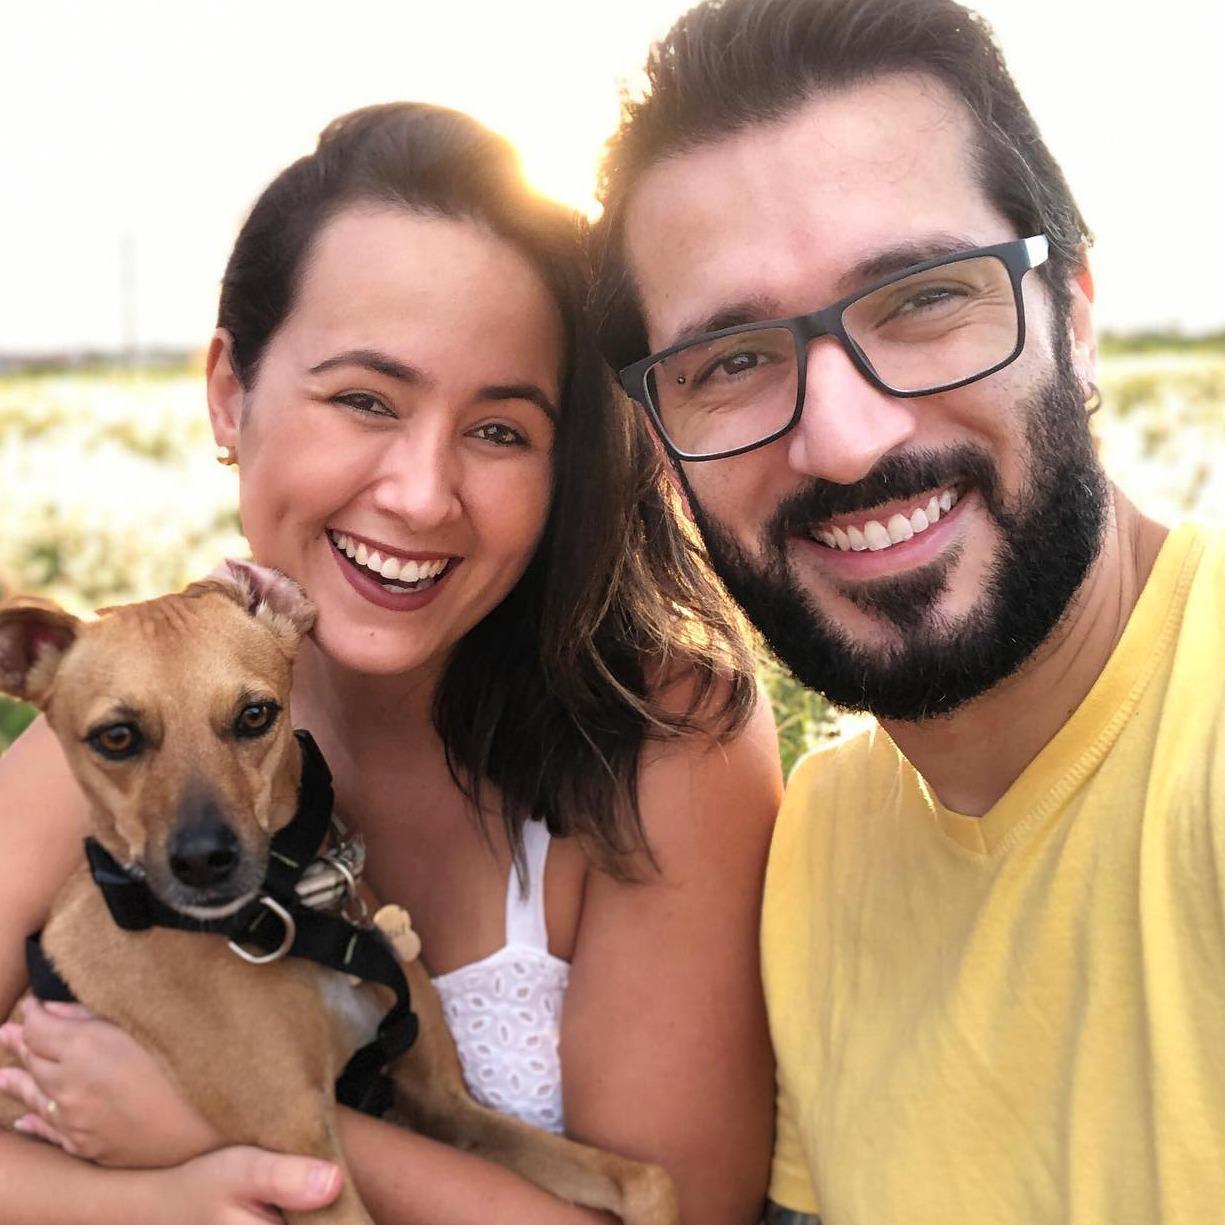 Família Pet na Estrada (petnaestrada_oficial) Profile Image | Linktree